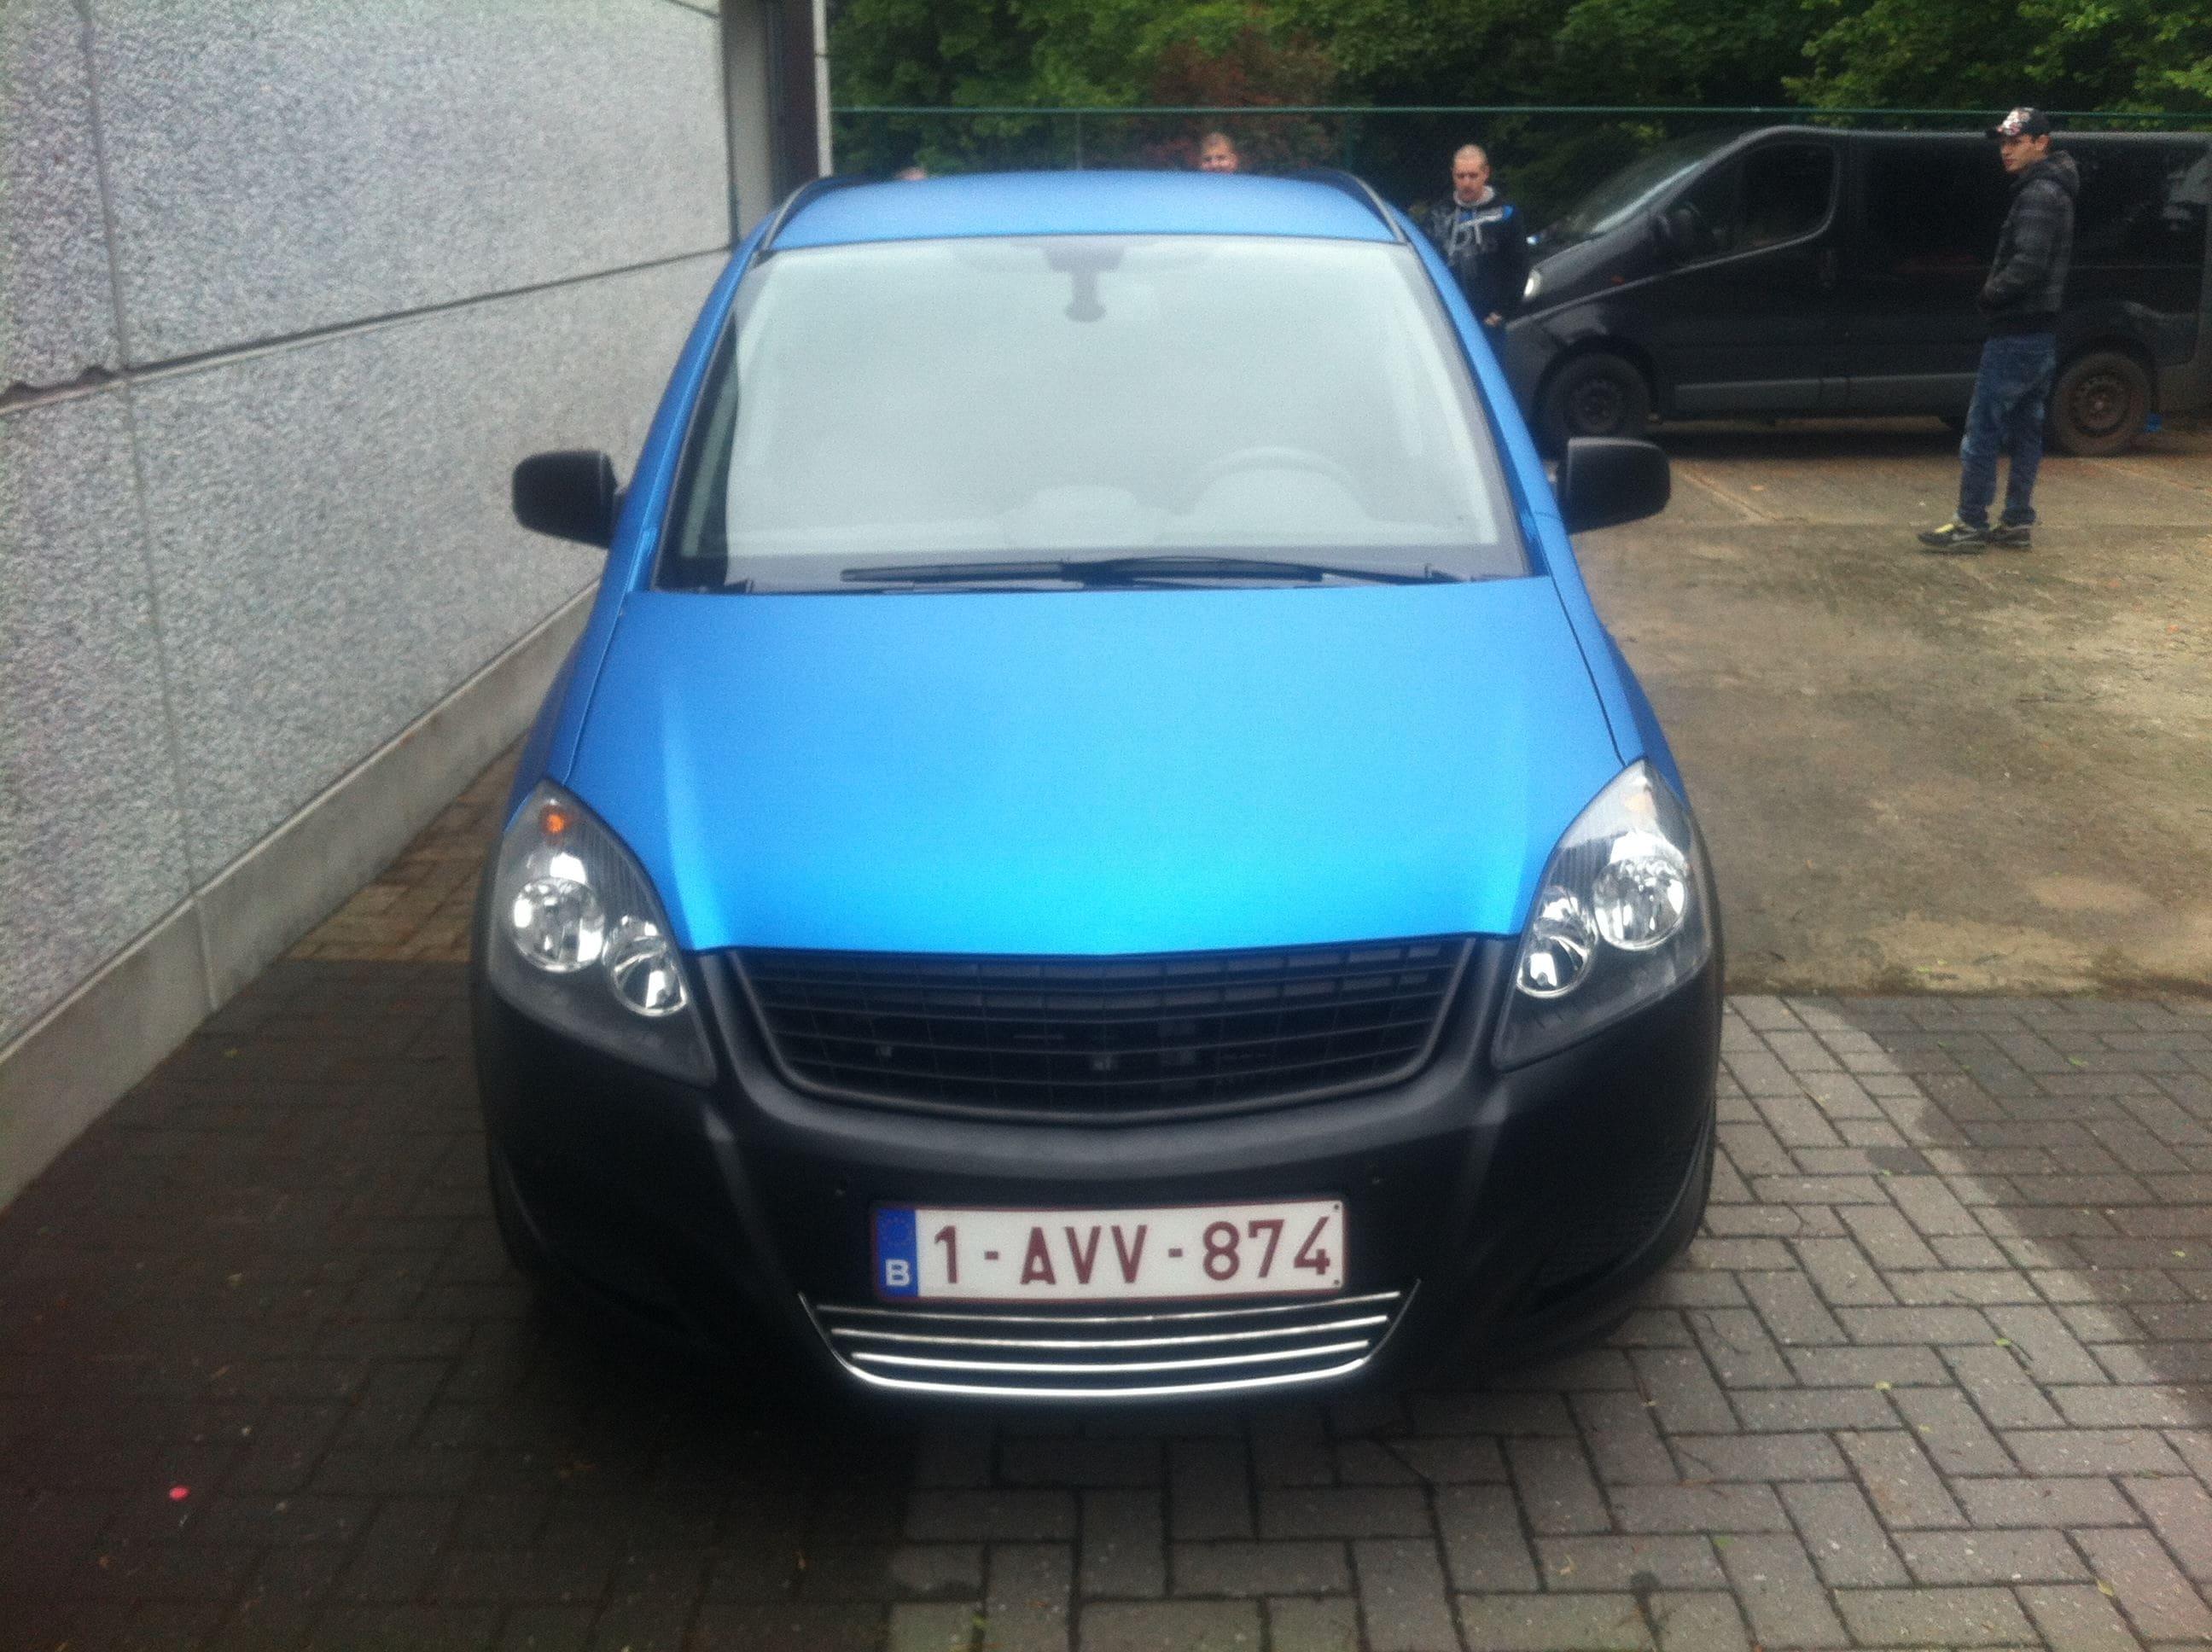 Opel Zafira met Two-Tone Wrap, Carwrapping door Wrapmyride.nu Foto-nr:6666, ©2021